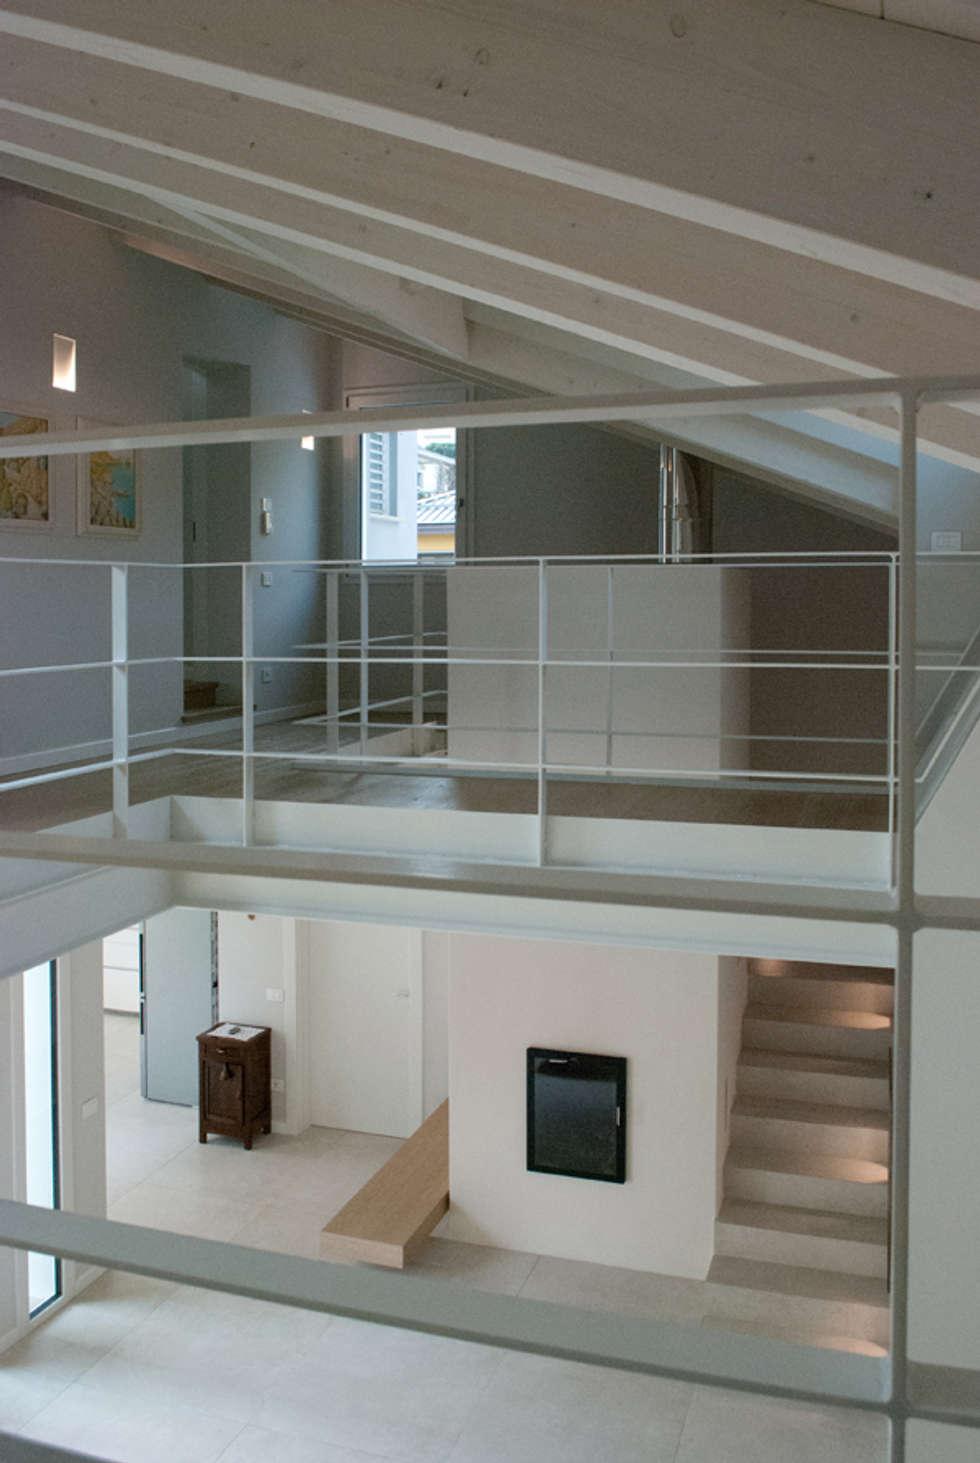 Idee arredamento casa interior design homify - Idee ingresso casa moderna ...